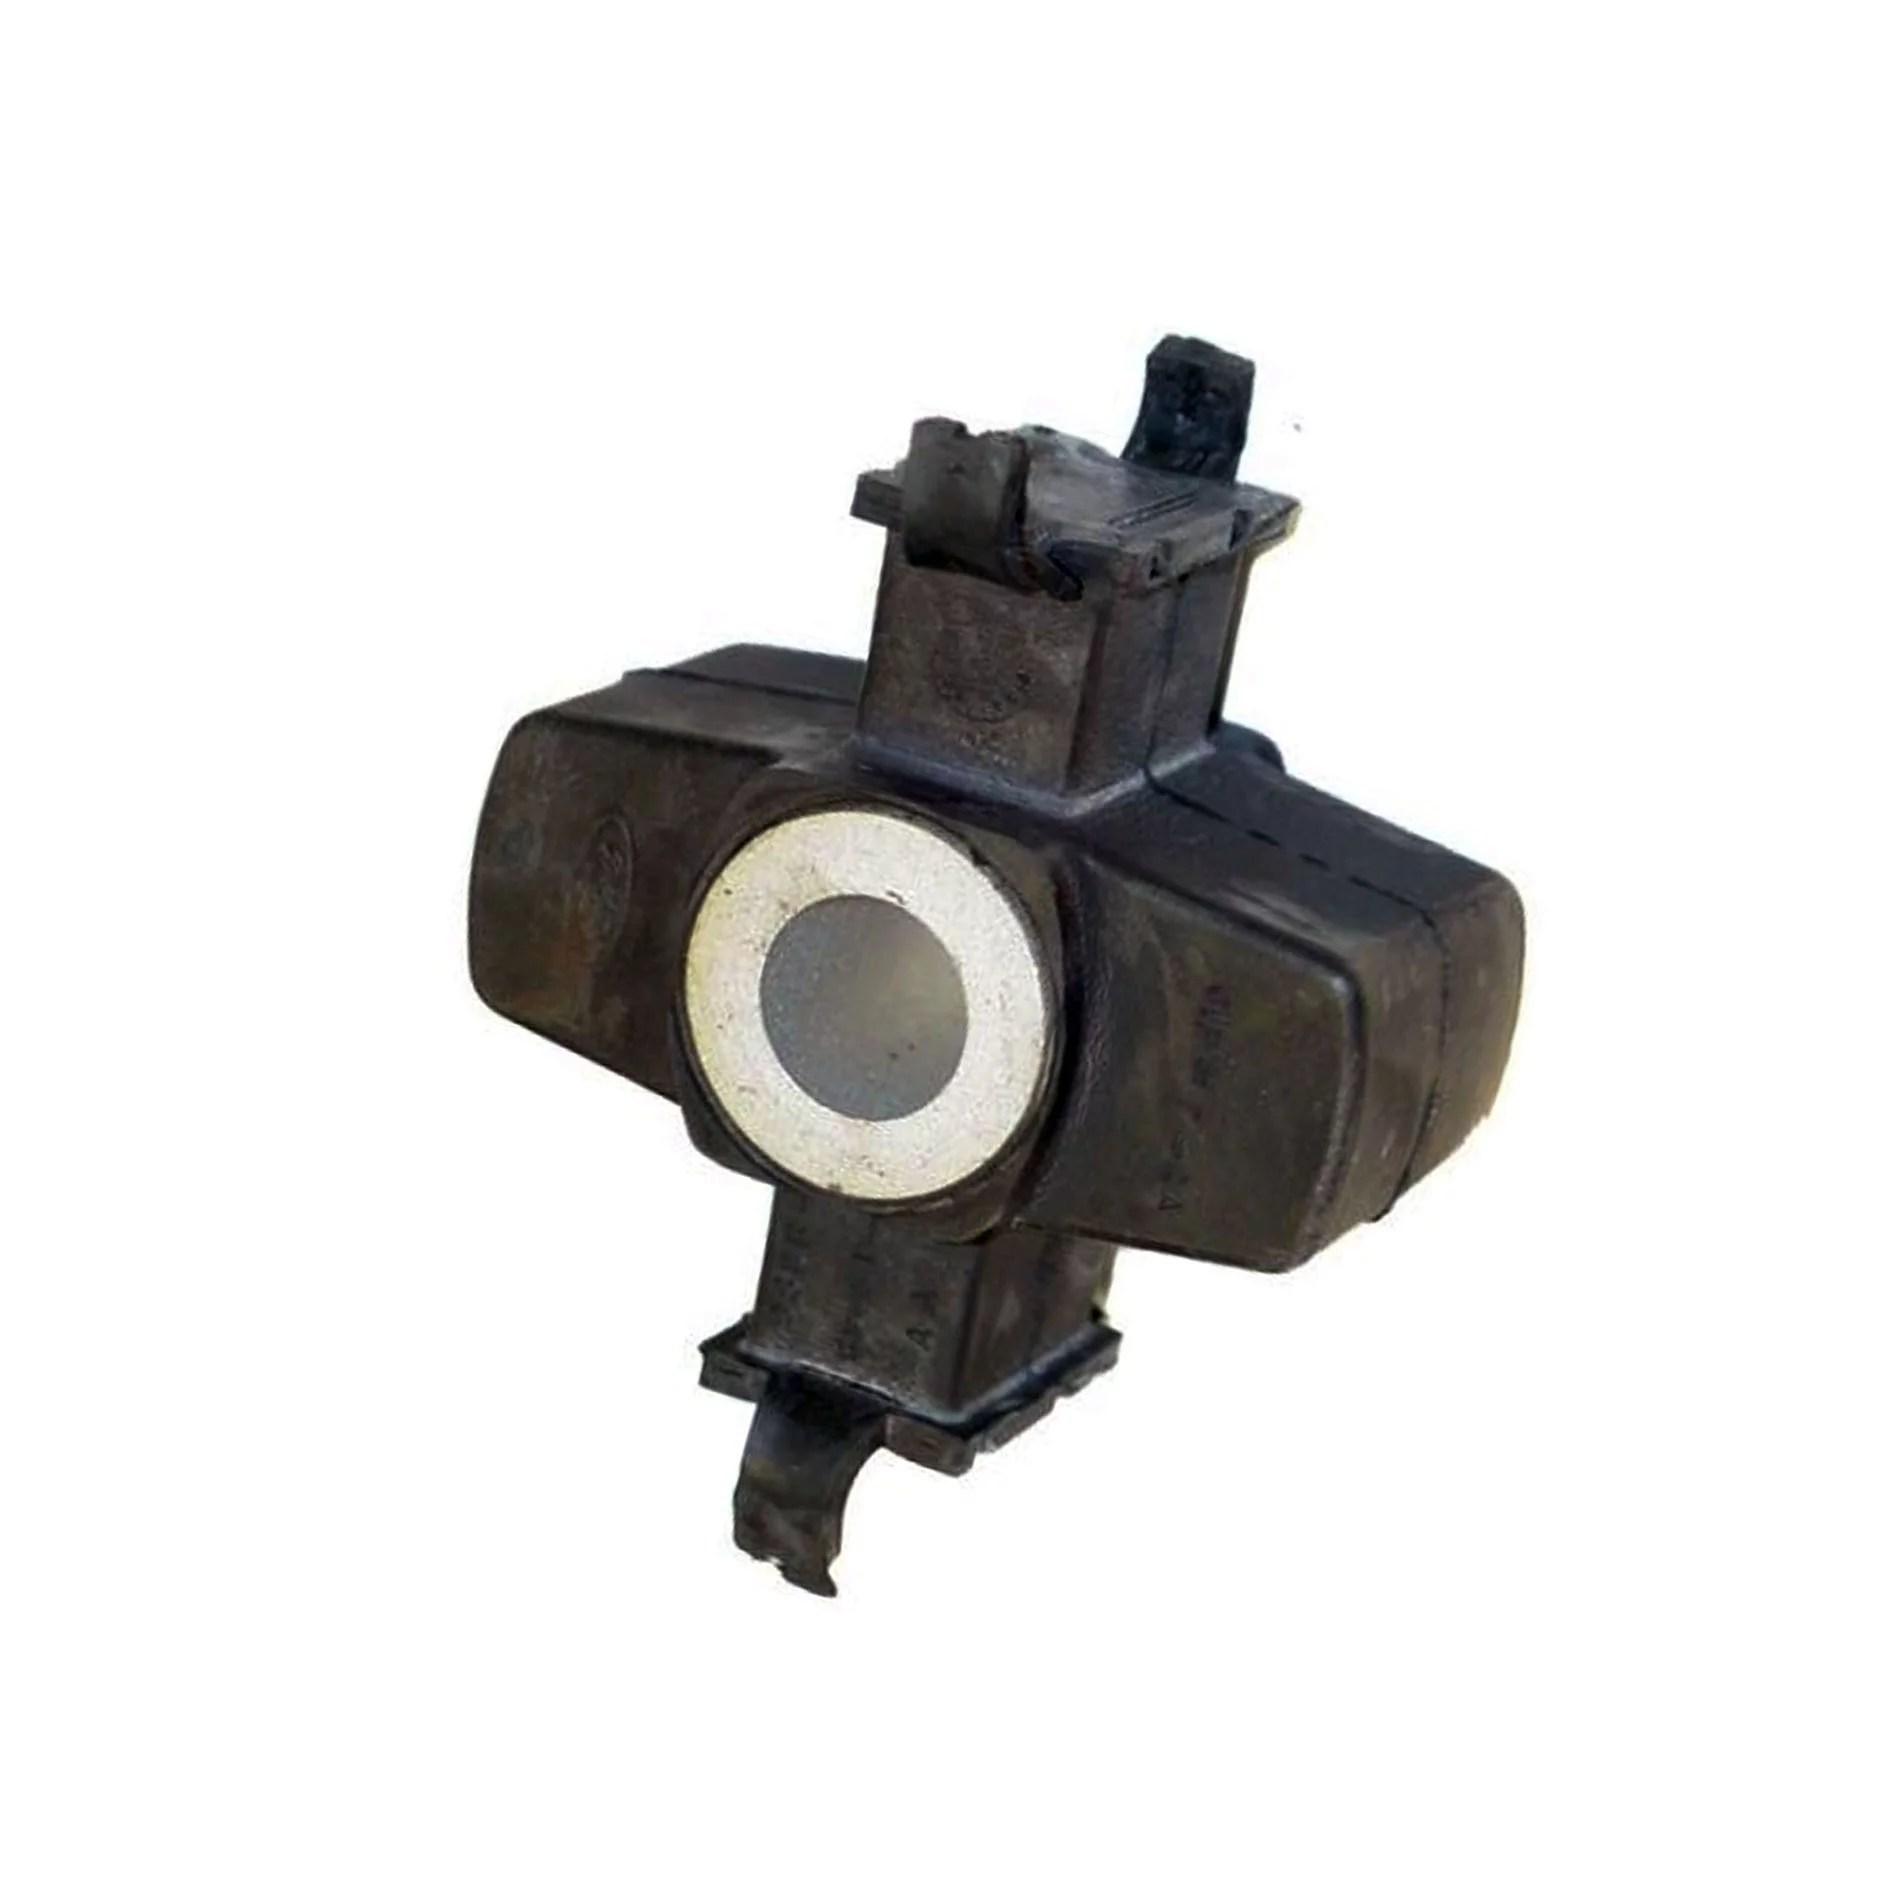 hight resolution of for front 95 02 ford contour mercury mystique 2 0l 2 5l 2888 engine motor mount 95 96 97 98 99 00 01 02 walmart com